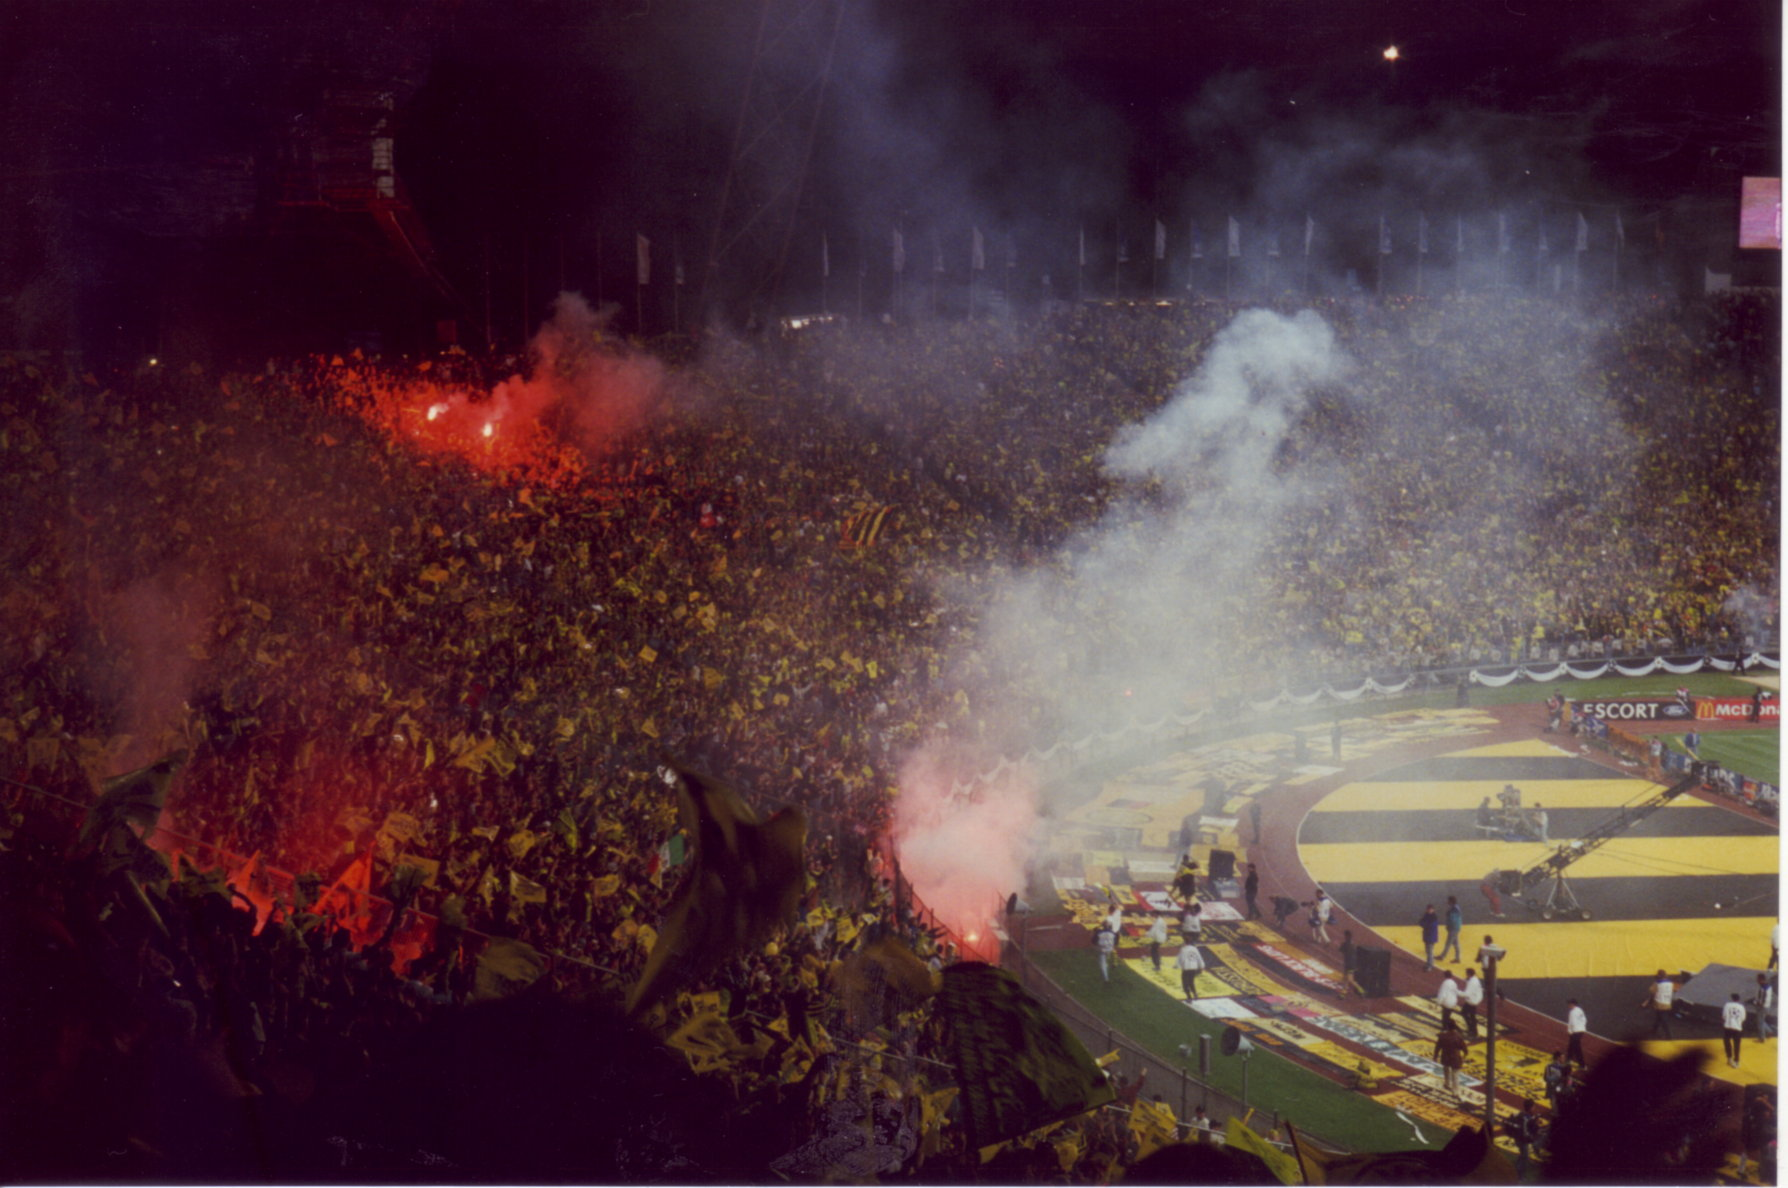 Pyro in the stadium